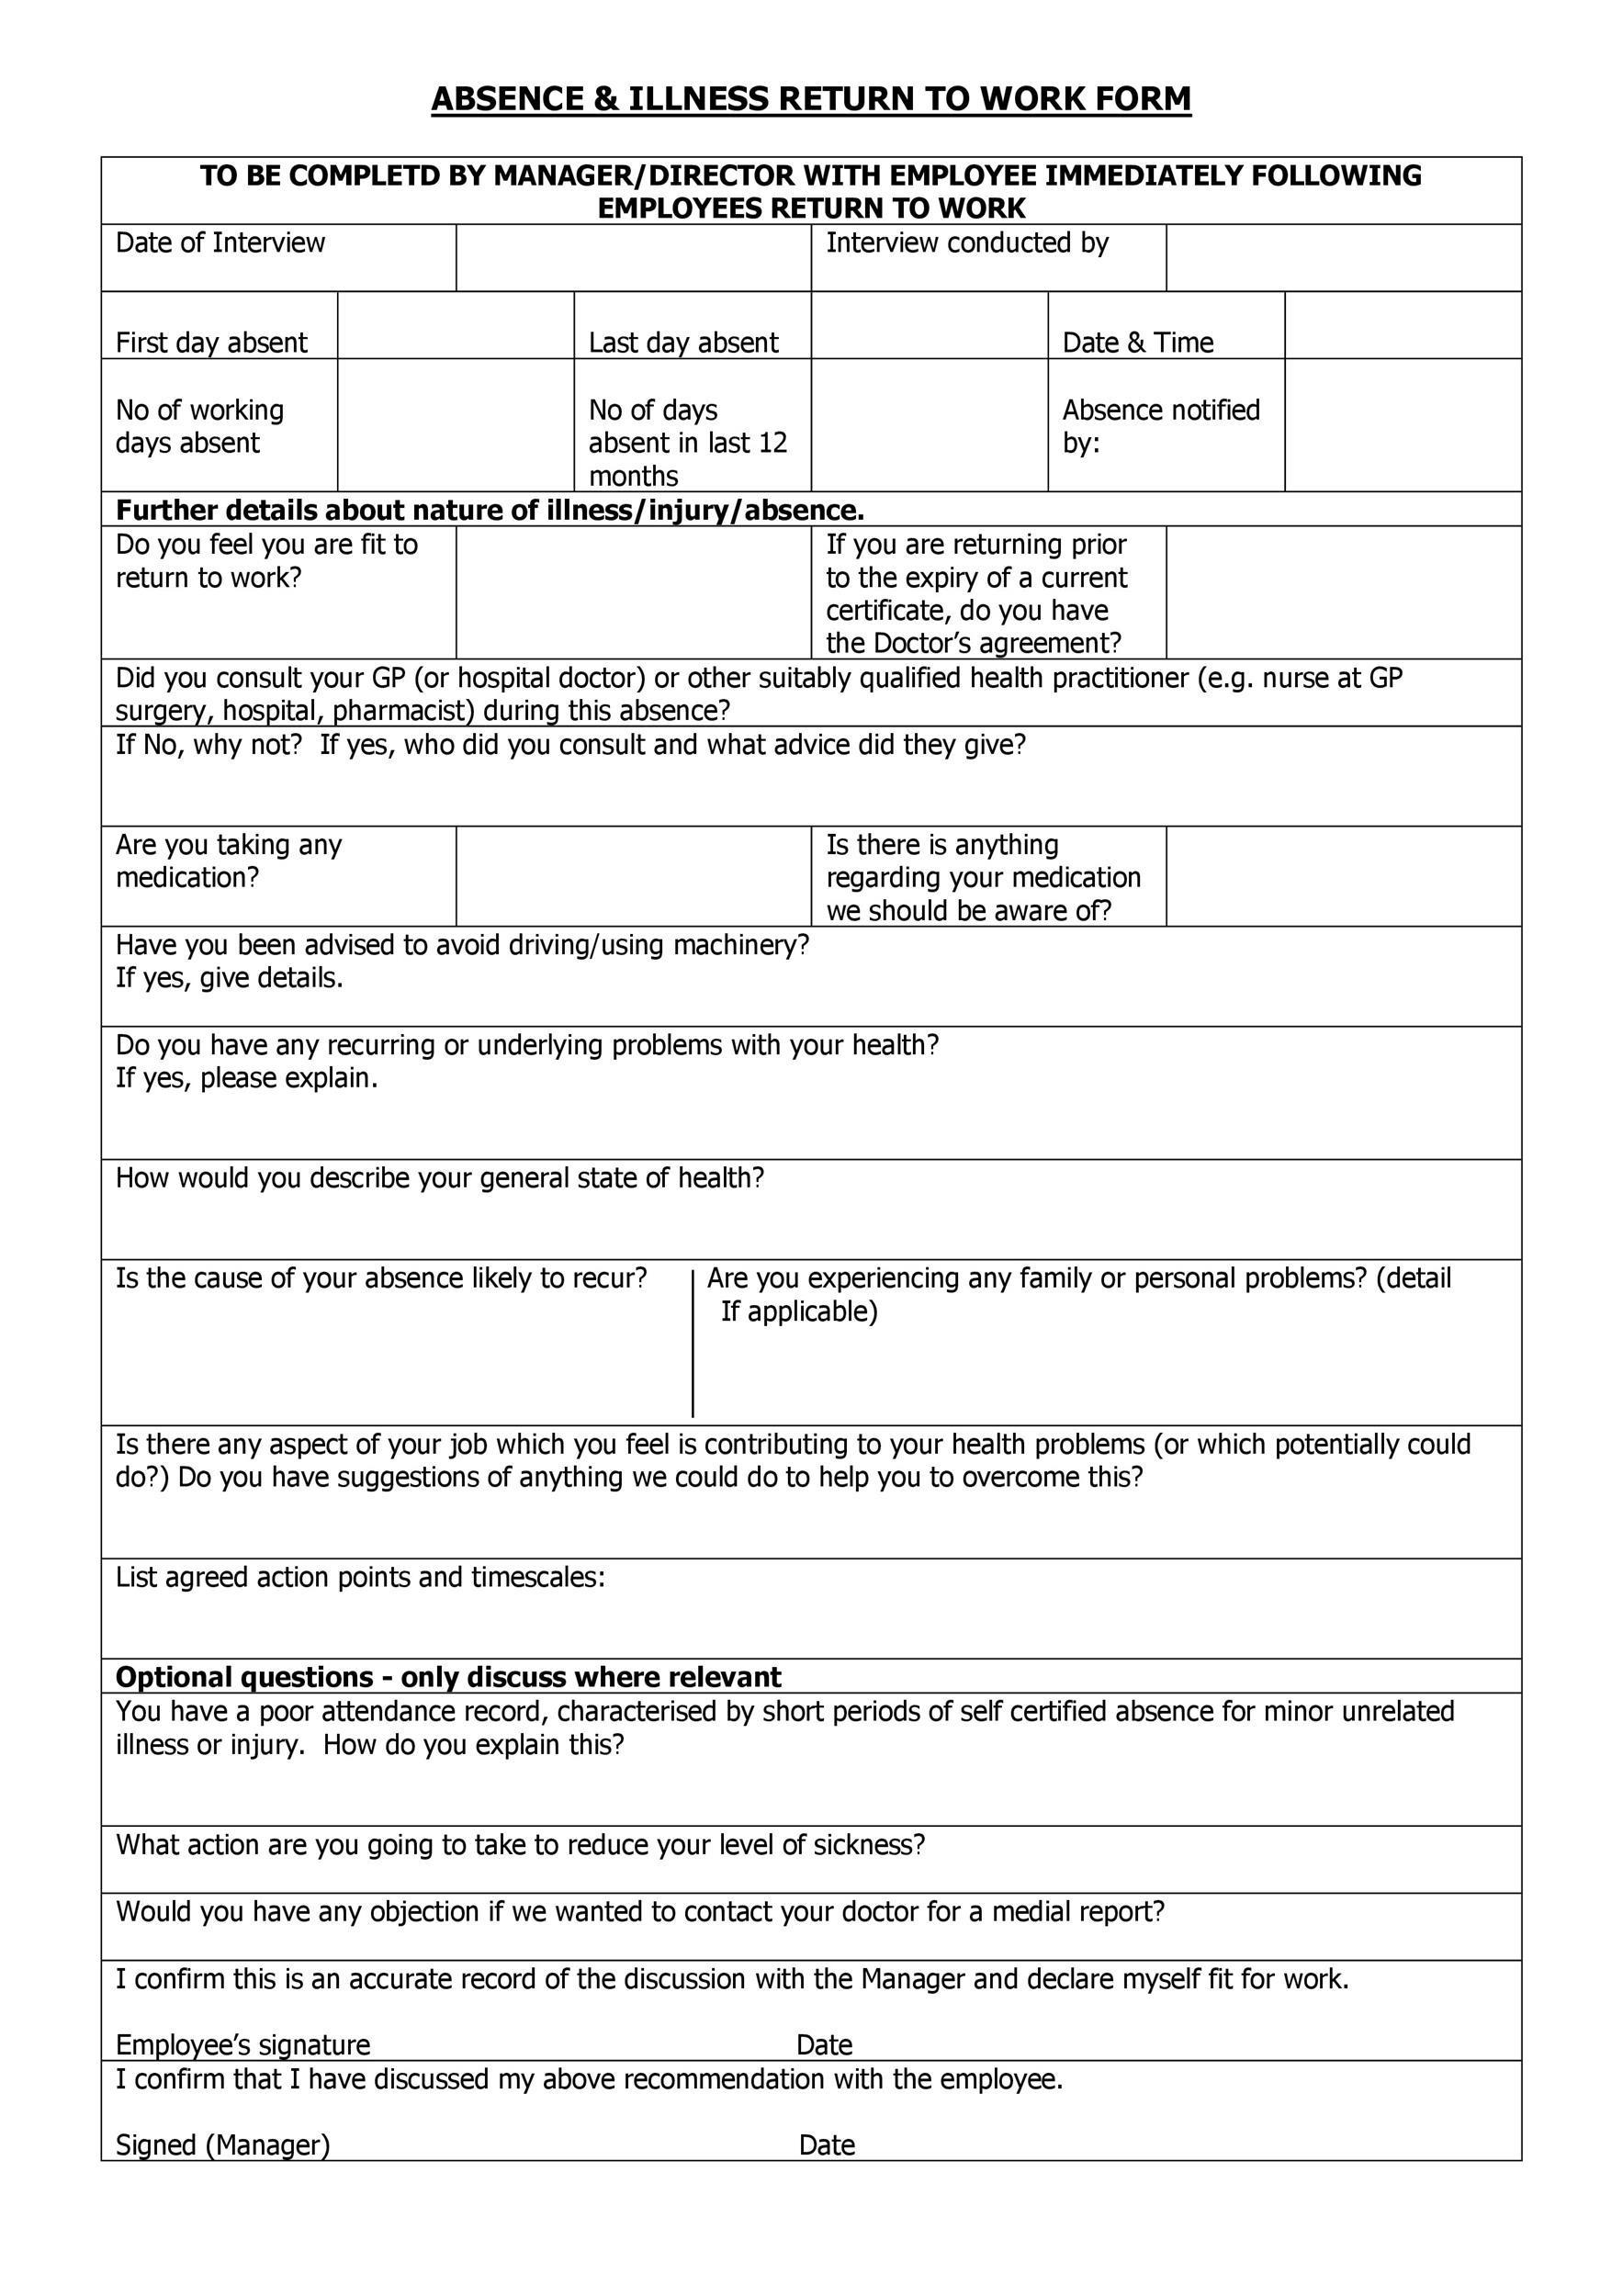 Free return to work form 01